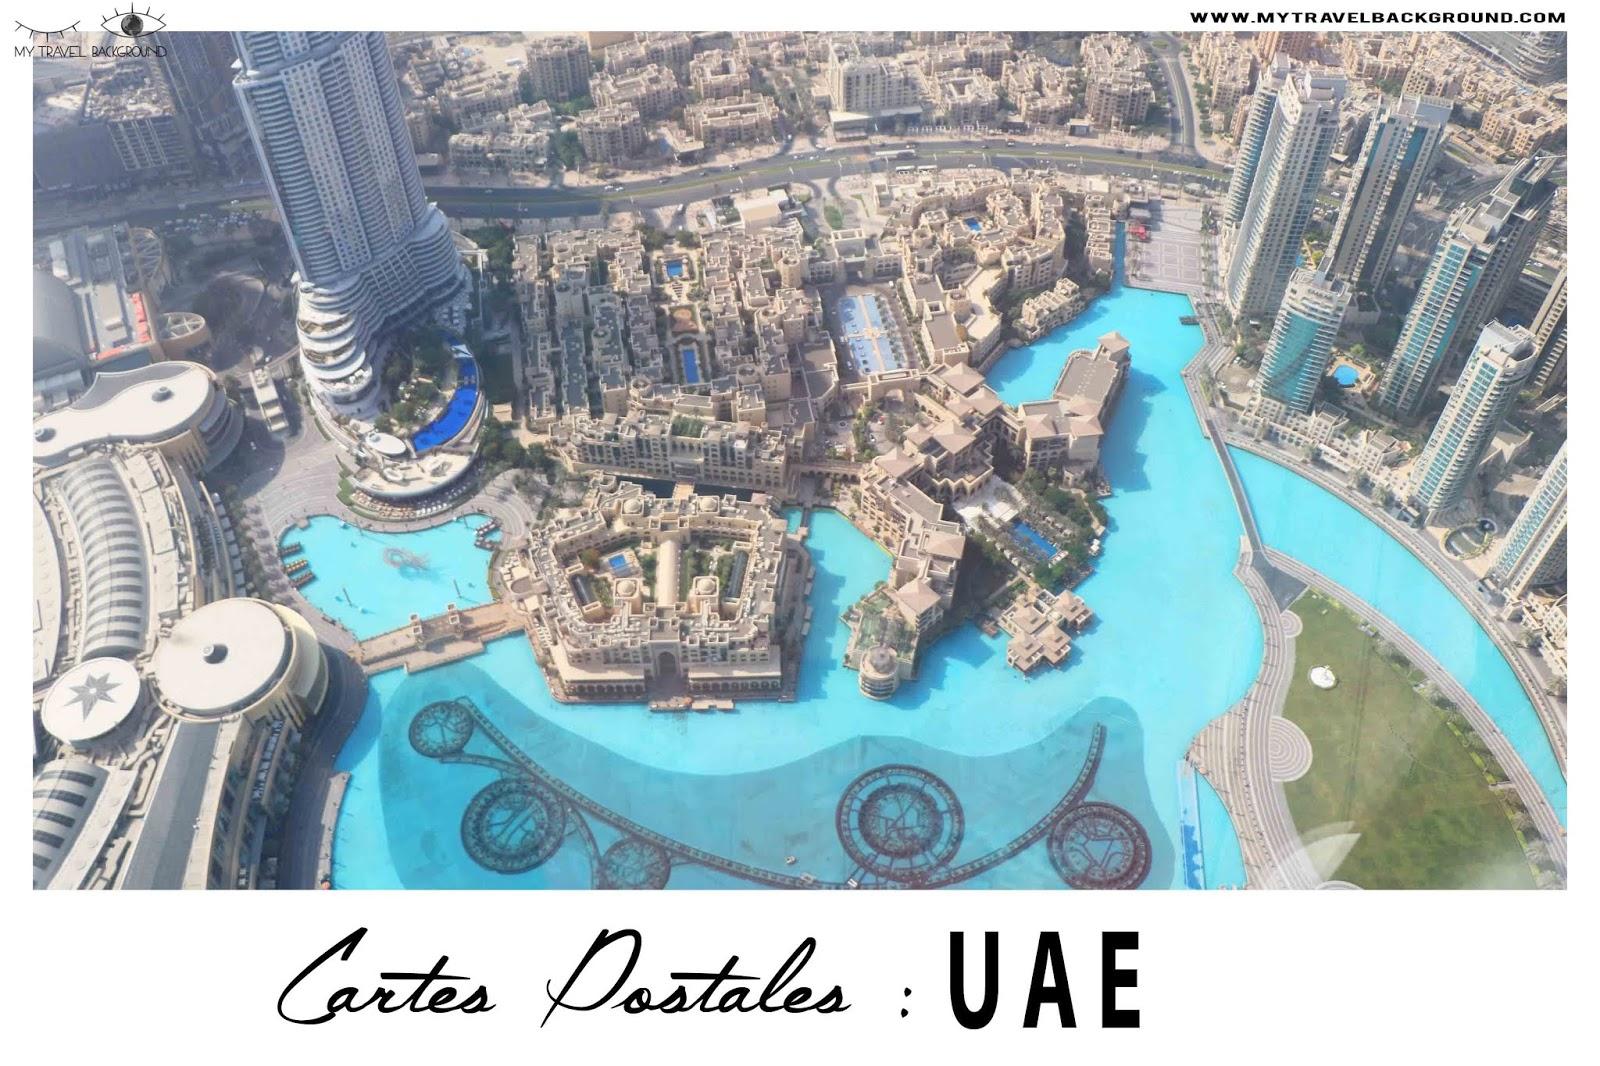 My Travel Background : cartes postales des Emirats Arabes Unis